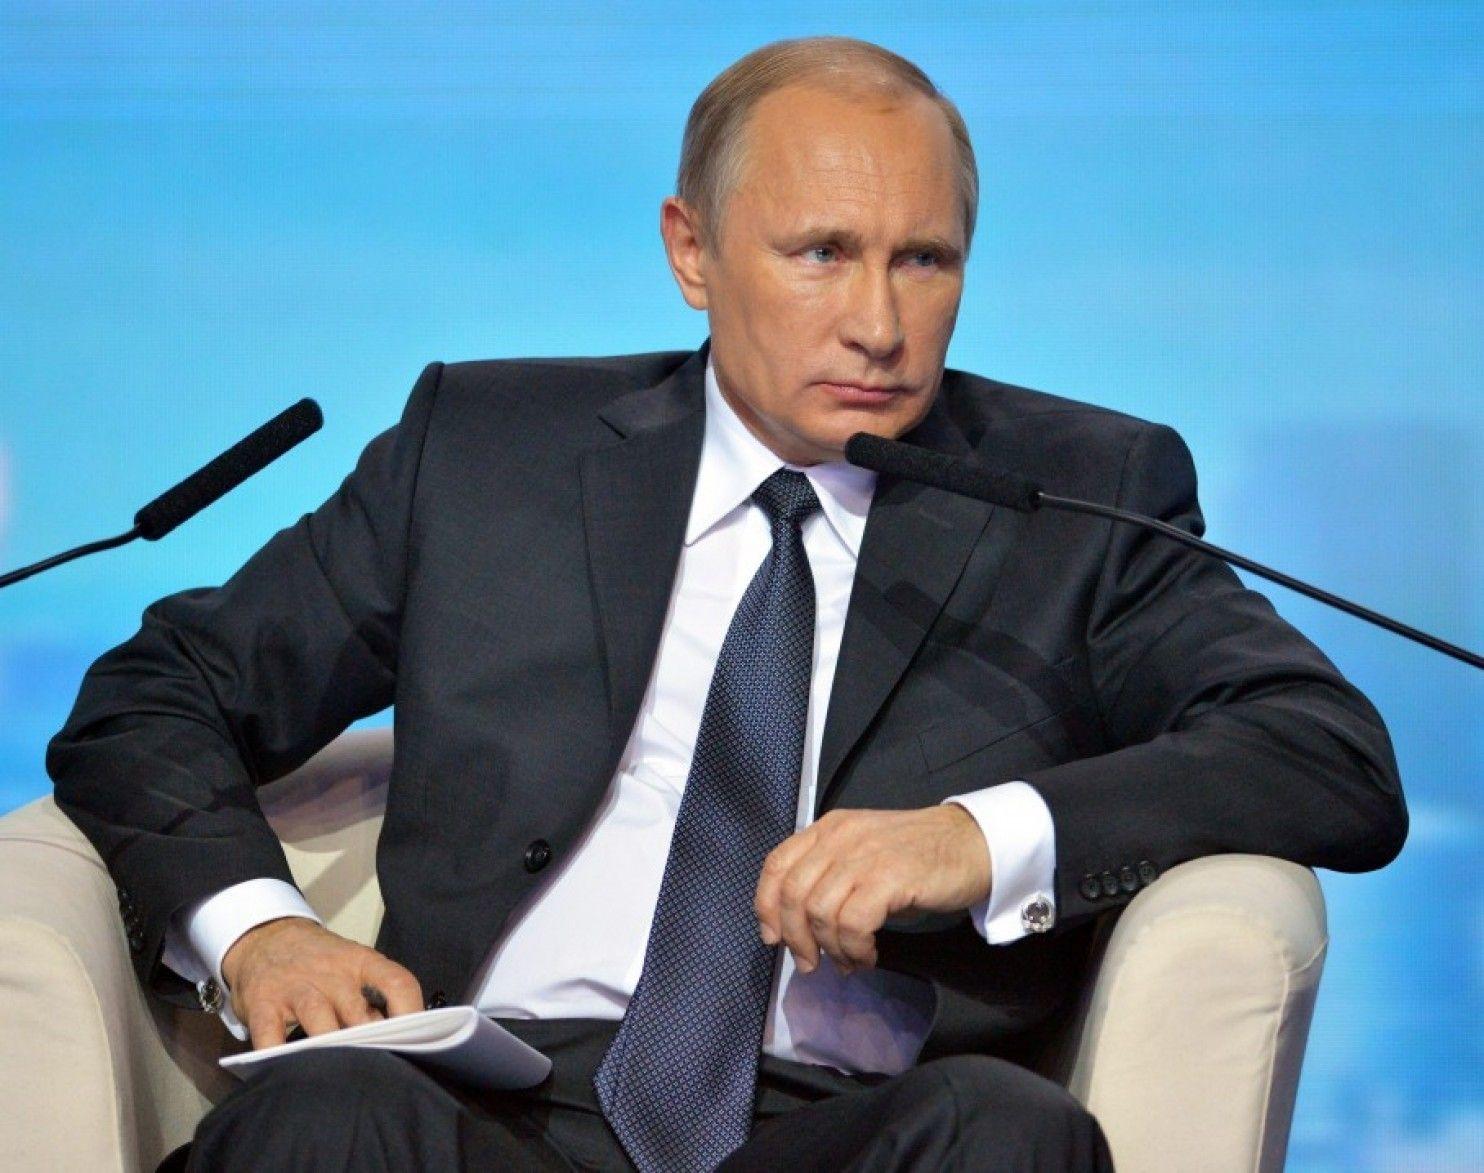 Sorry, Putin. Russia's economy is doomed - The Washington Post